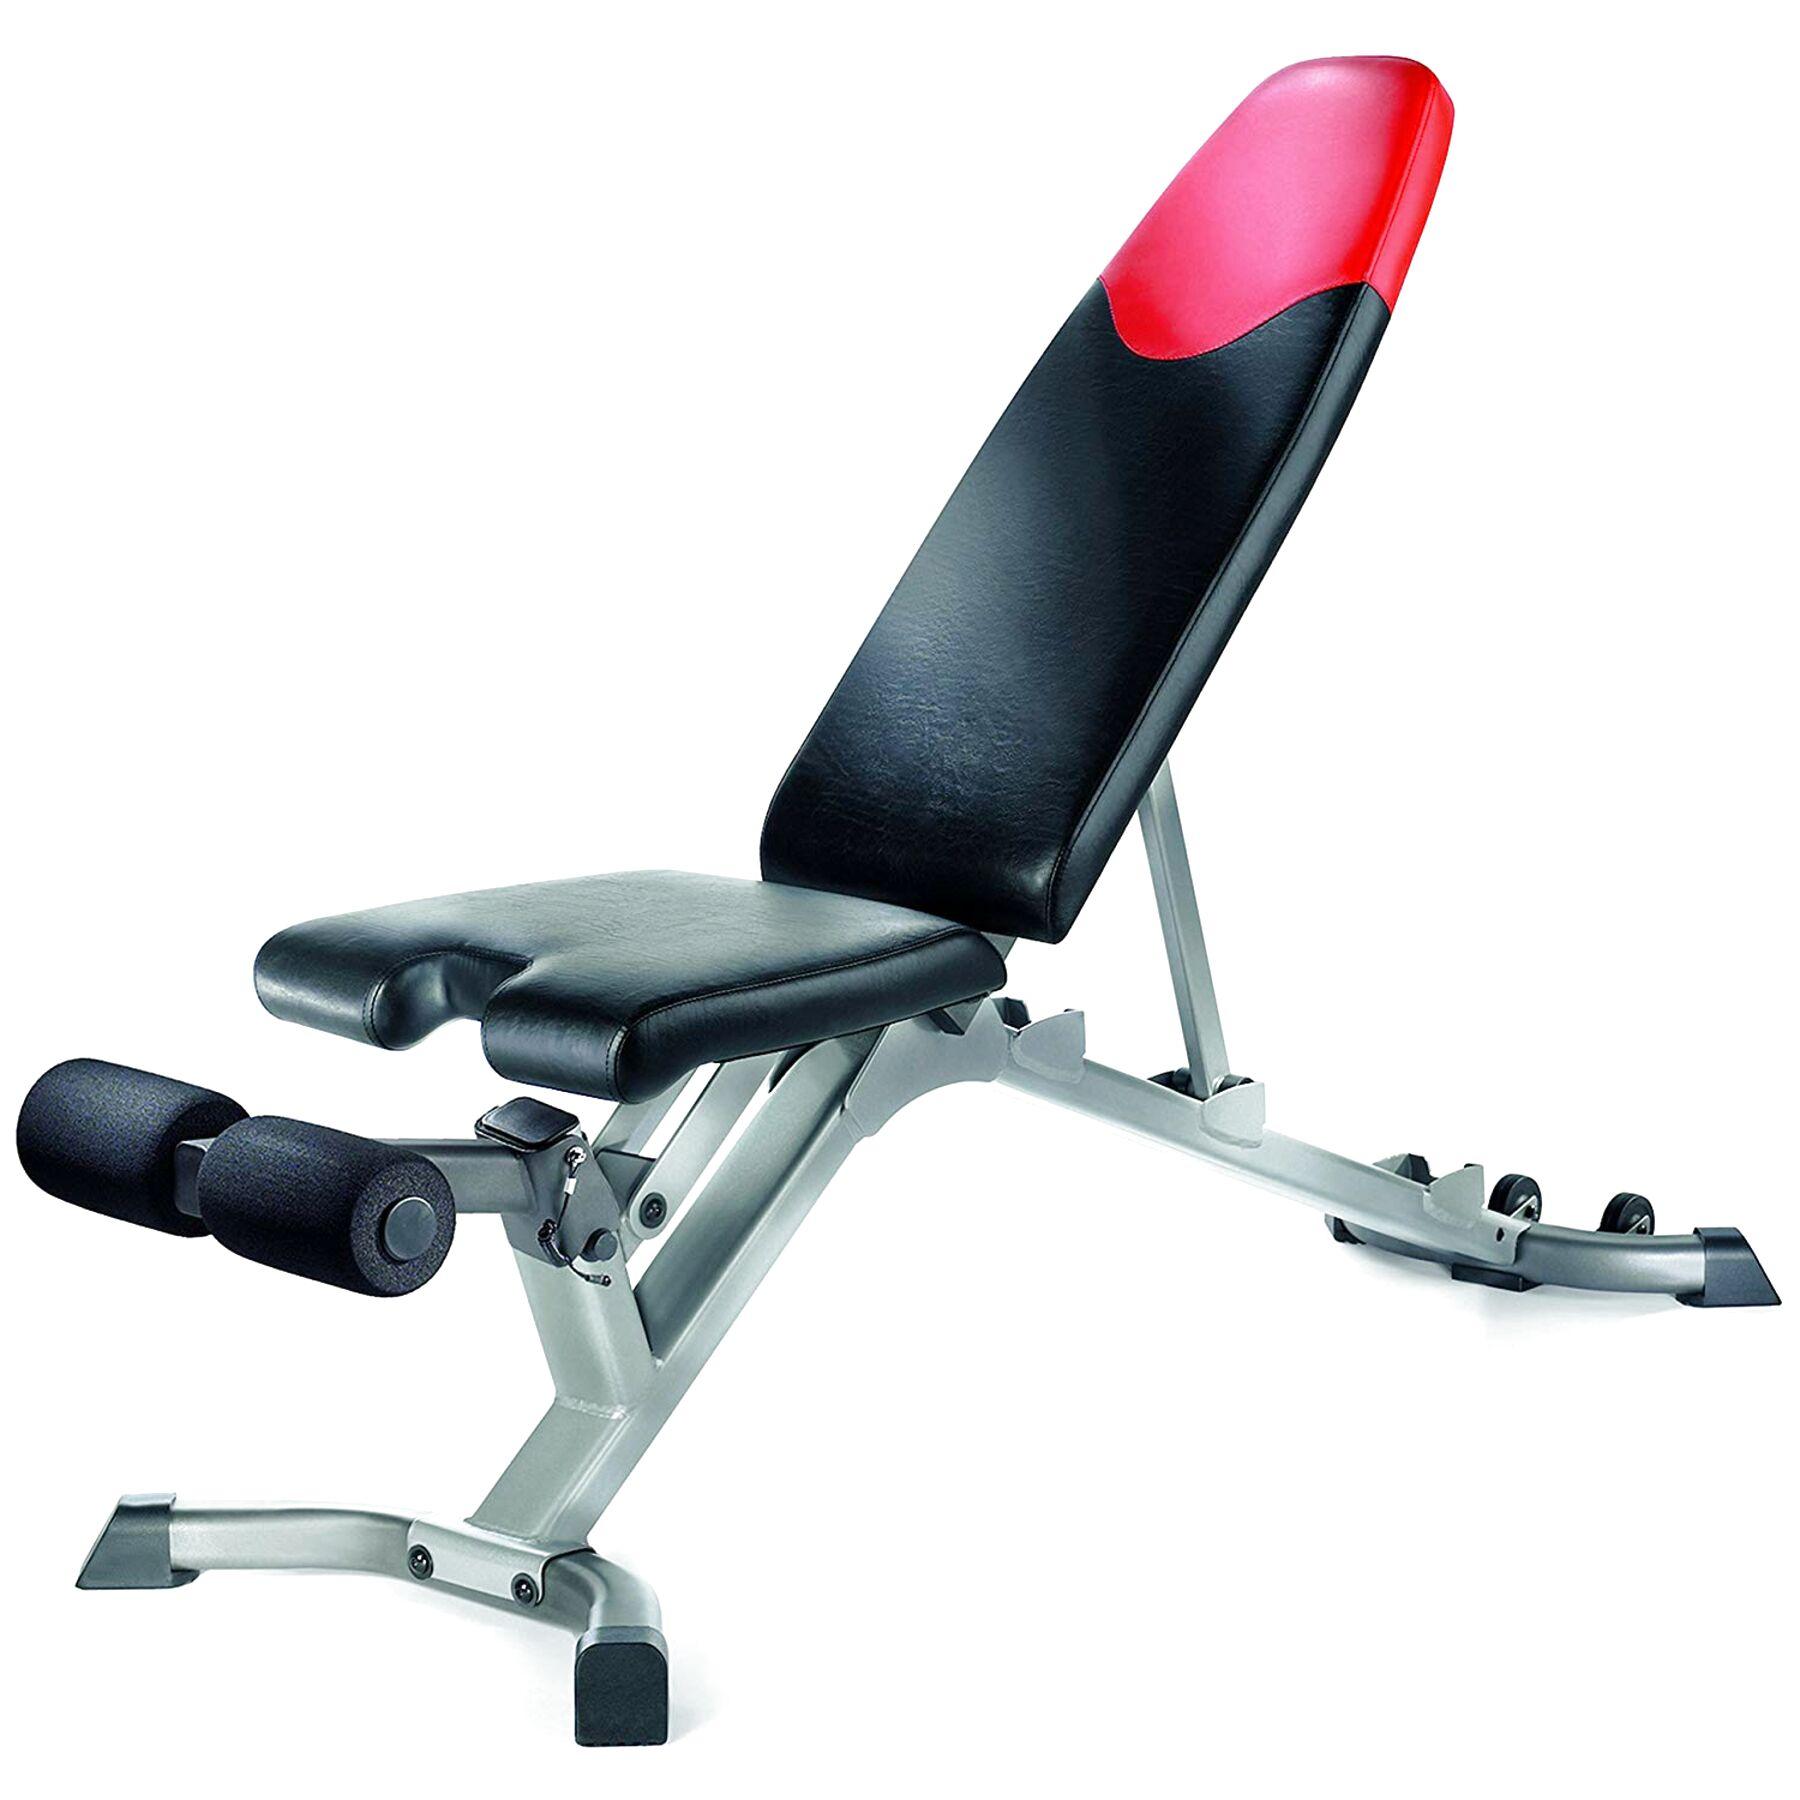 bowflex bench for sale